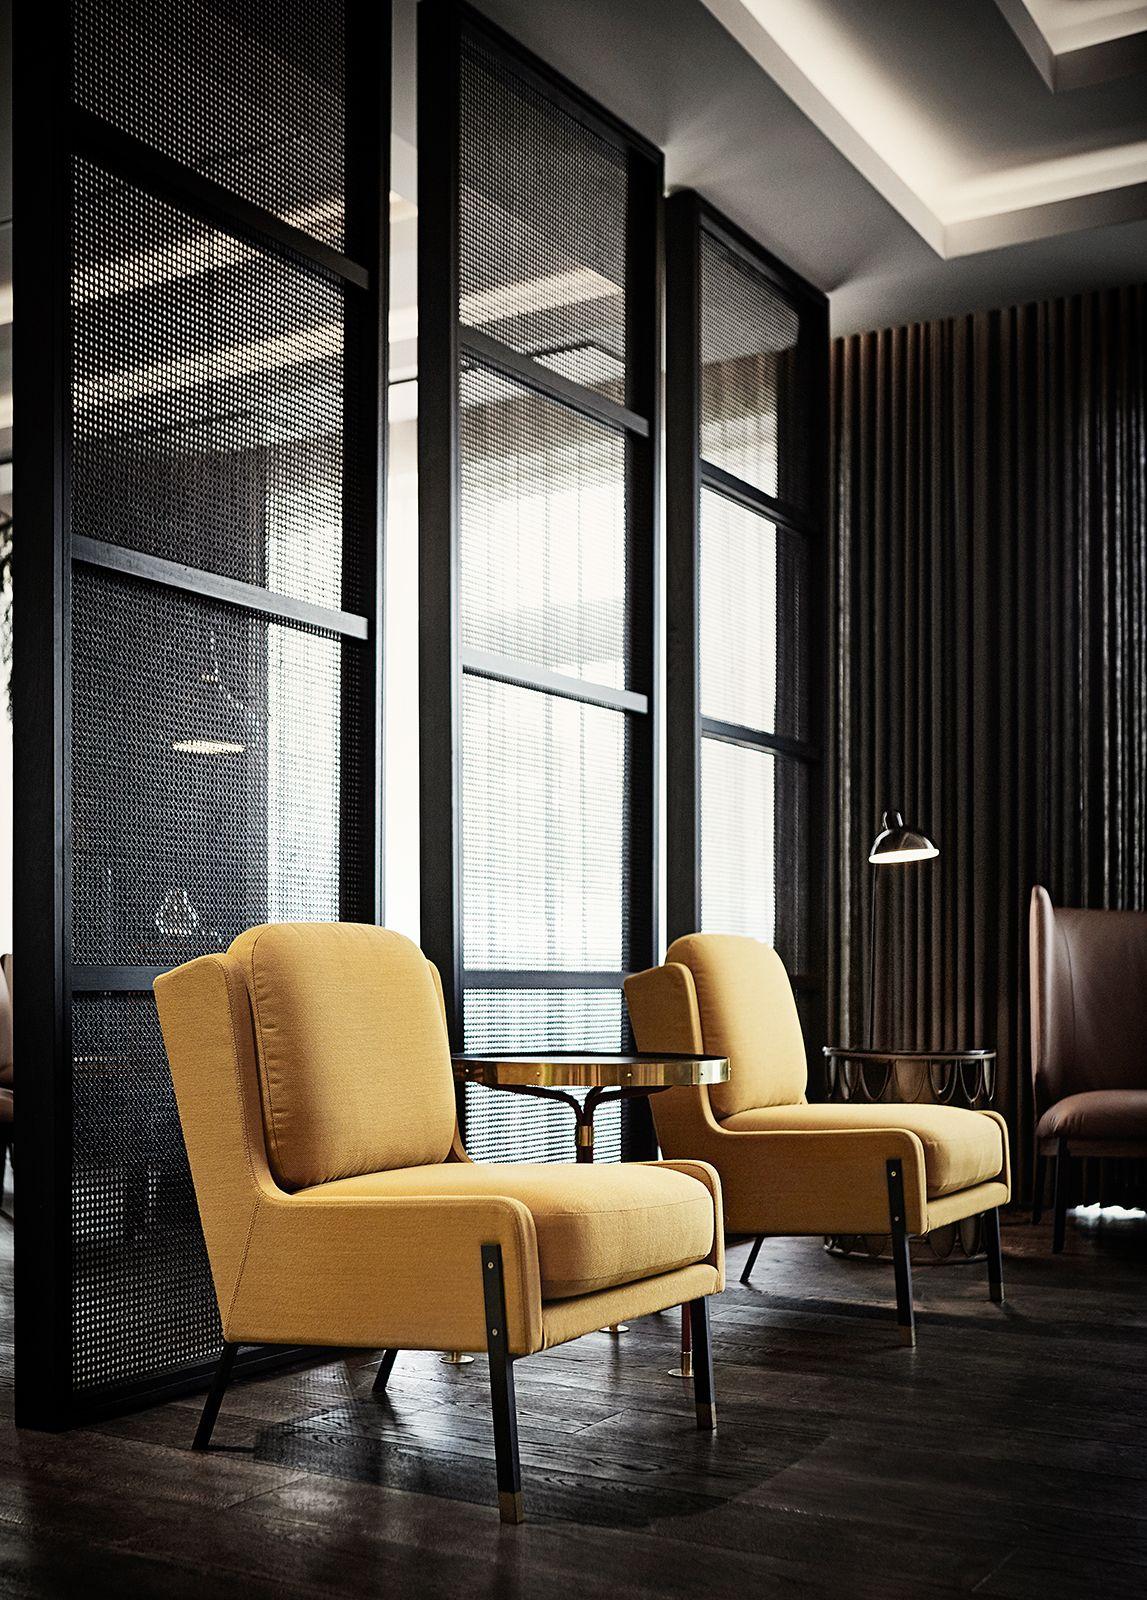 Hotel Rooms Interior Design: MARRIOTT COPENHAGEN - Executive Lounge